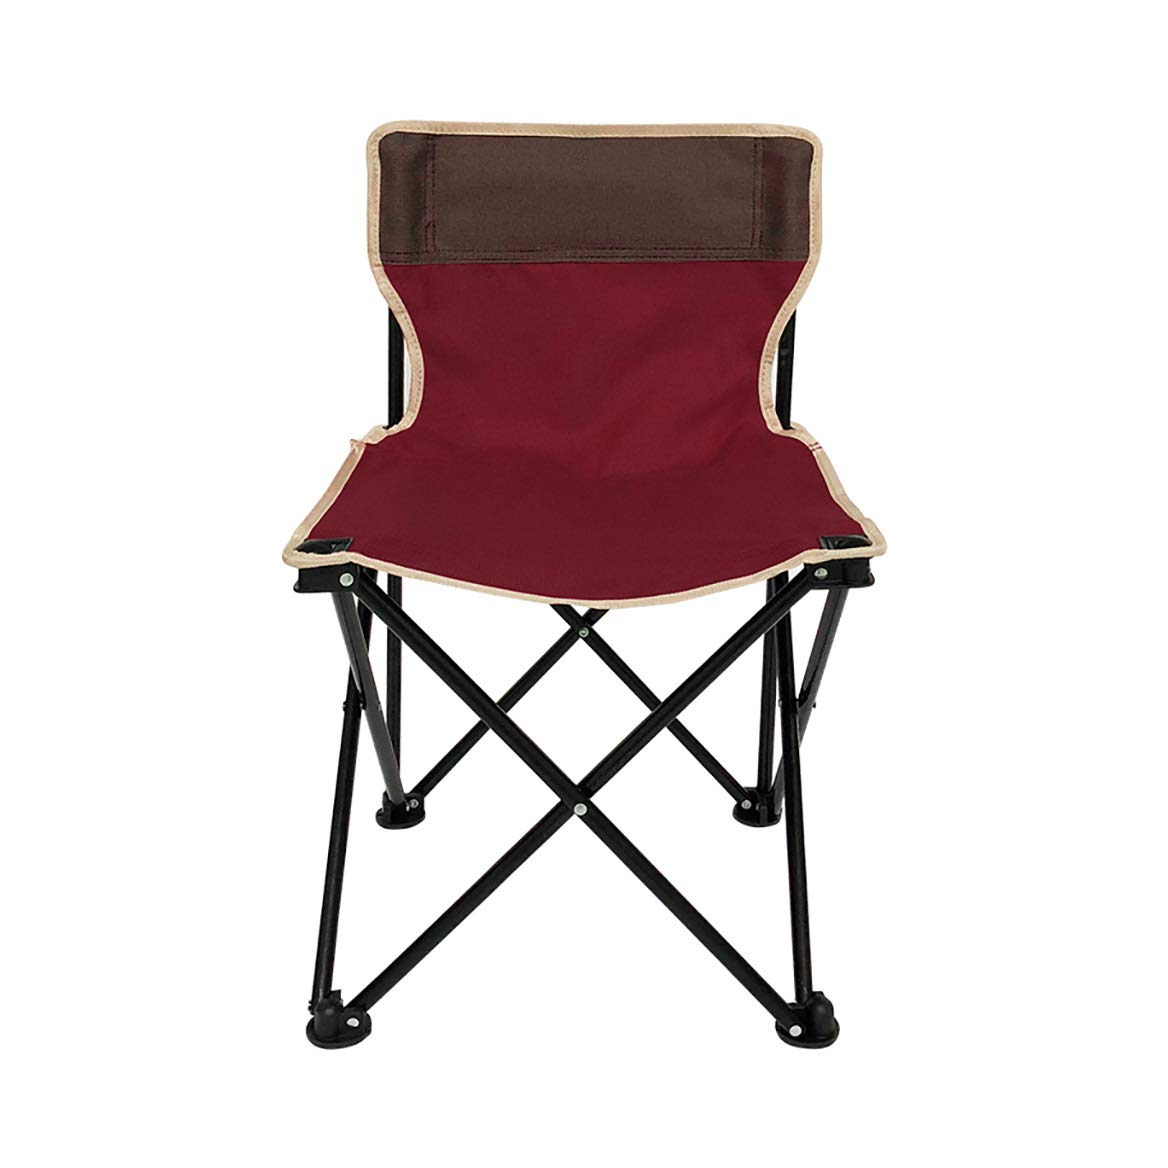 MLX Klappstuhl, Klappstuhl Angelstuhl Outdoor Camping Strandkorb Liegestuhl (38 × 38 × 60 cm)